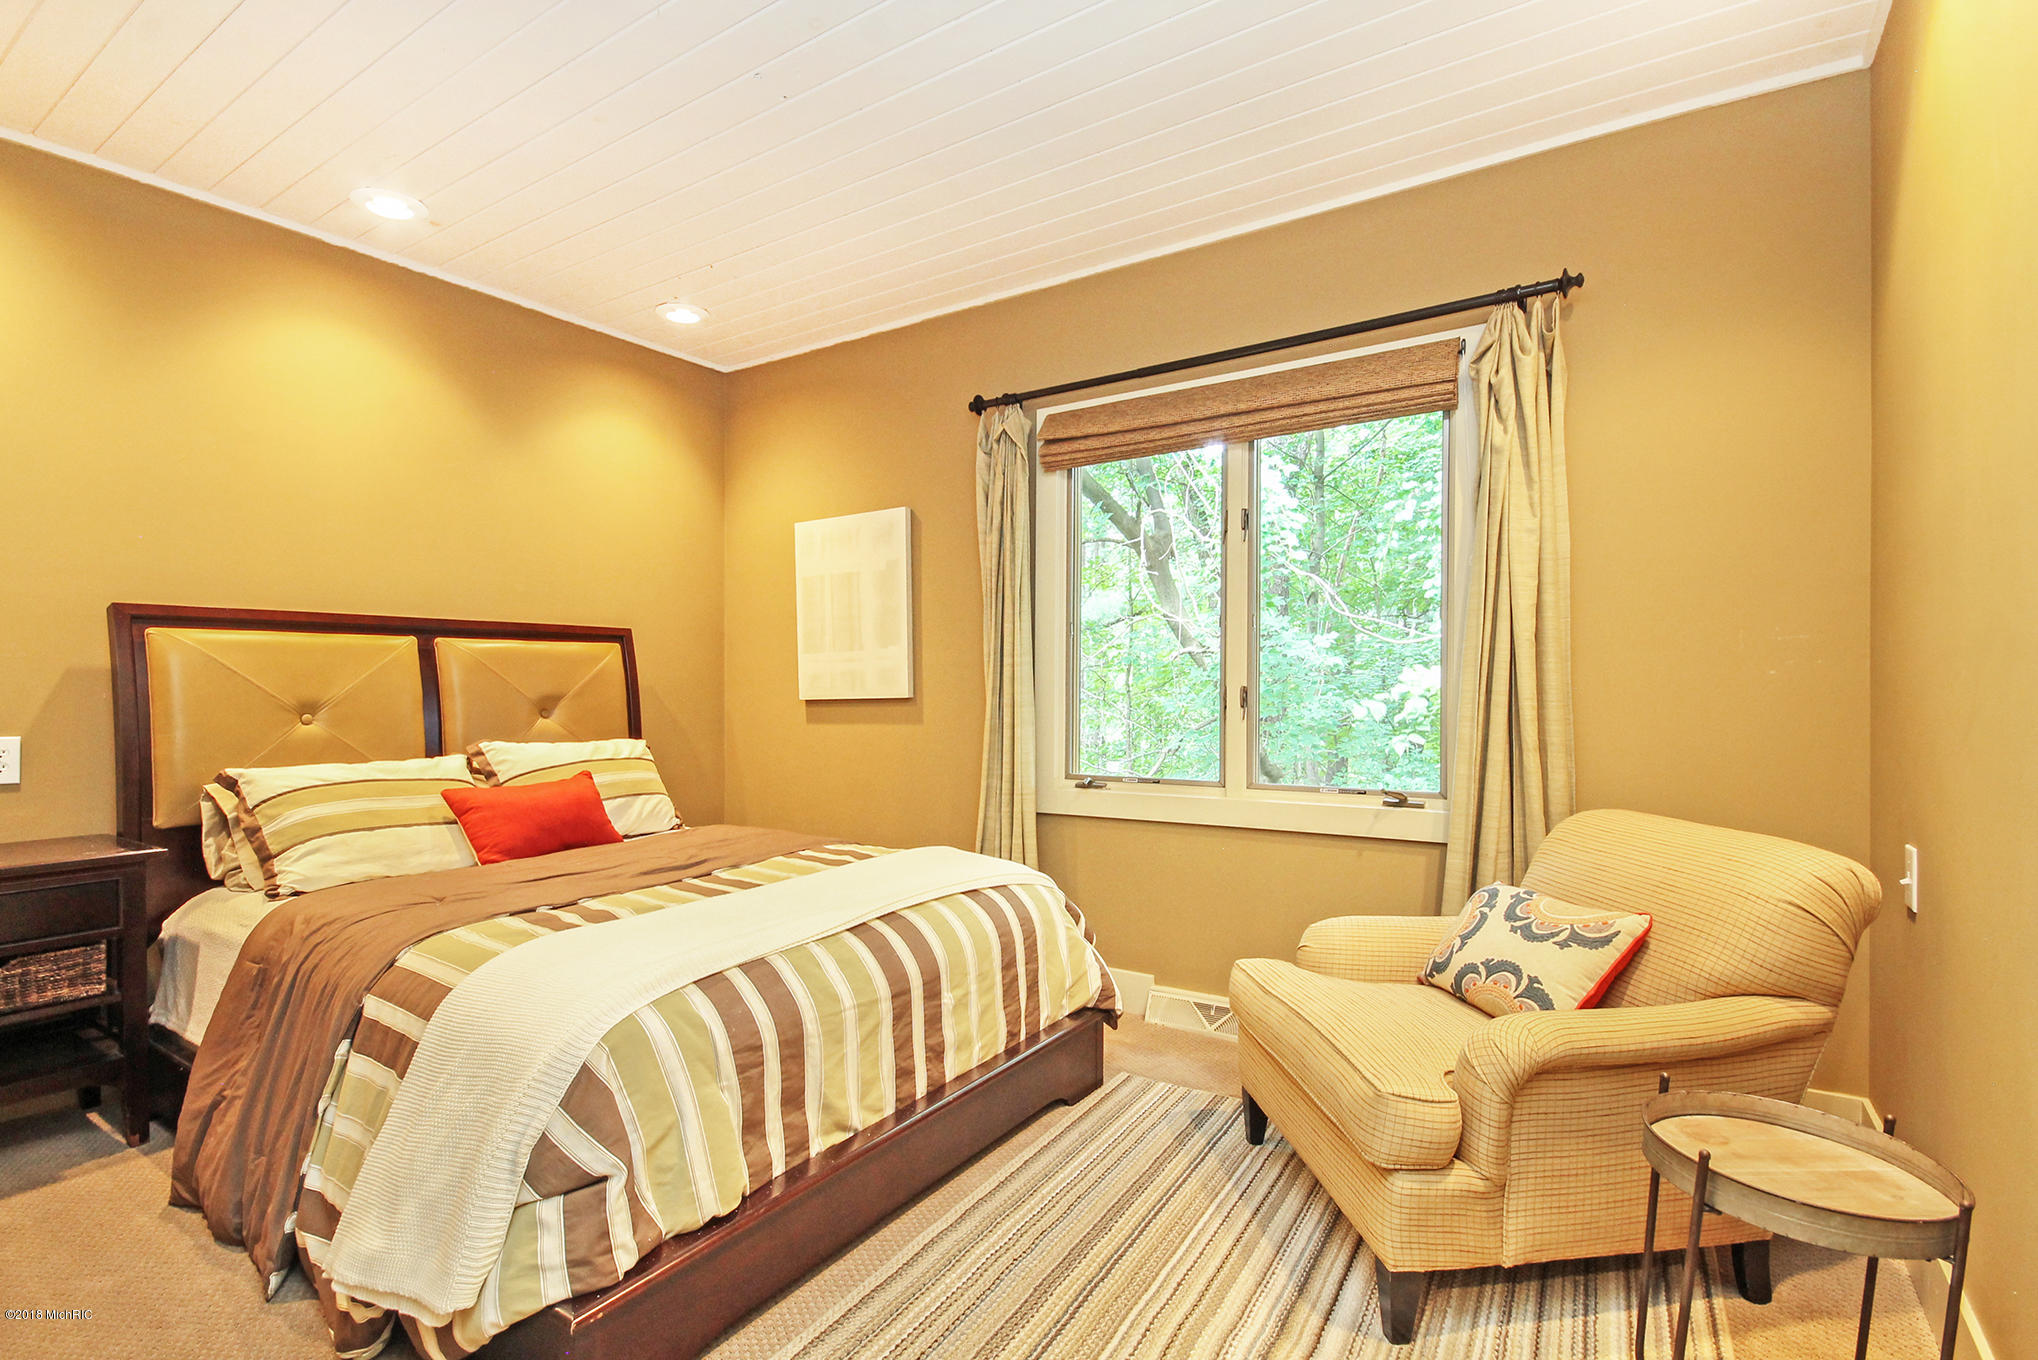 22new-bedroom4.jpg